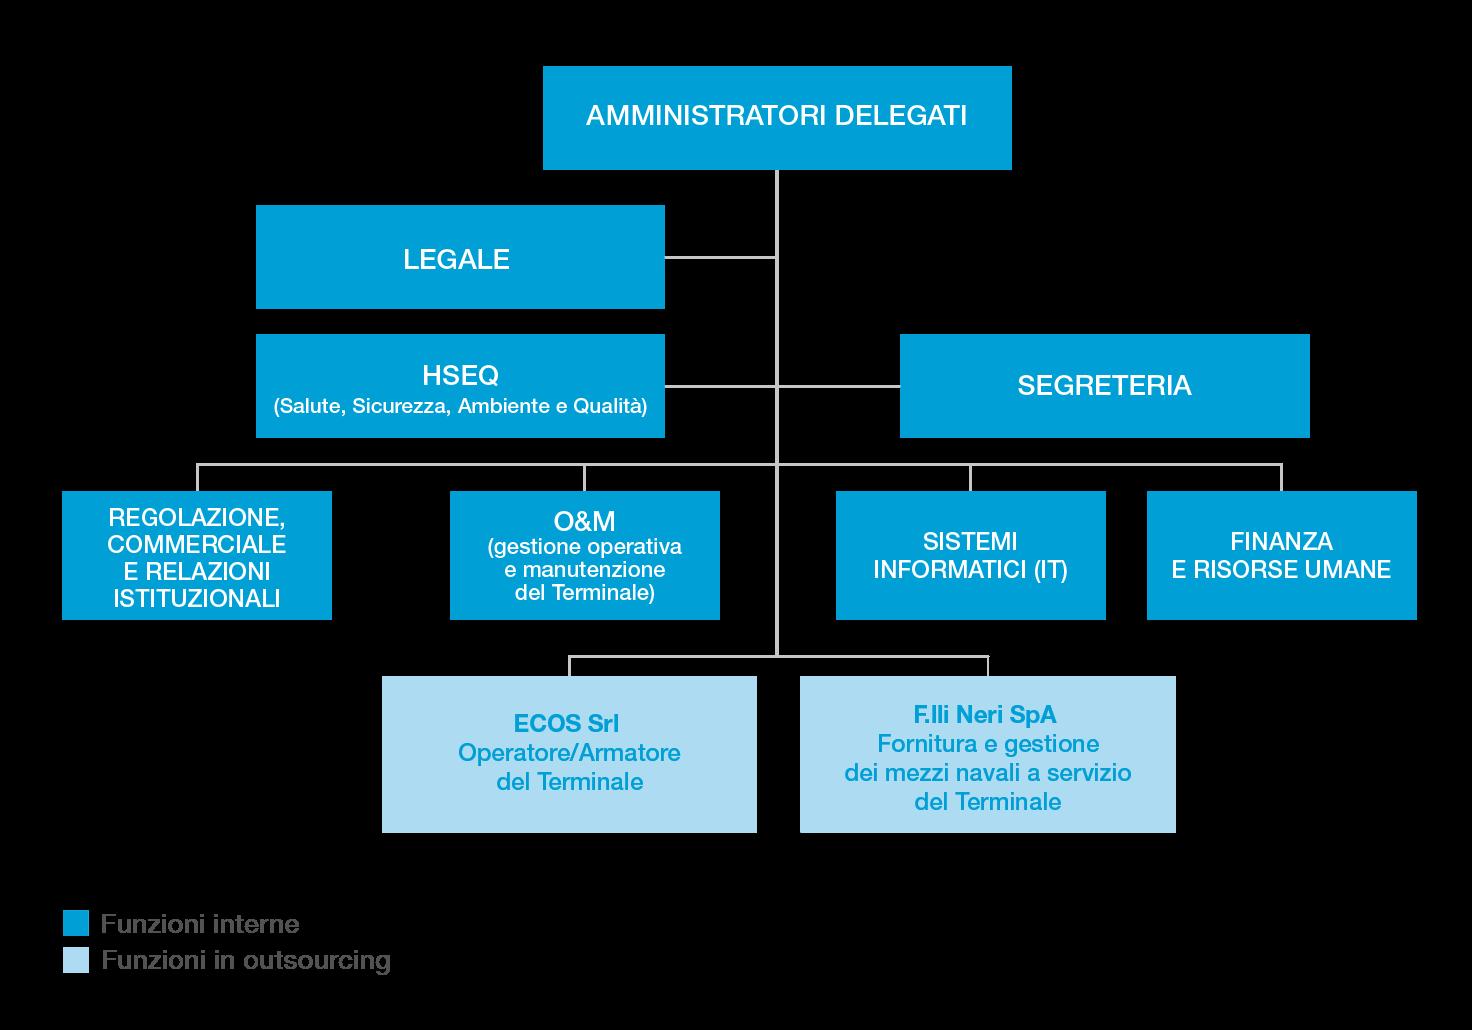 La struttura funzionale di OLT